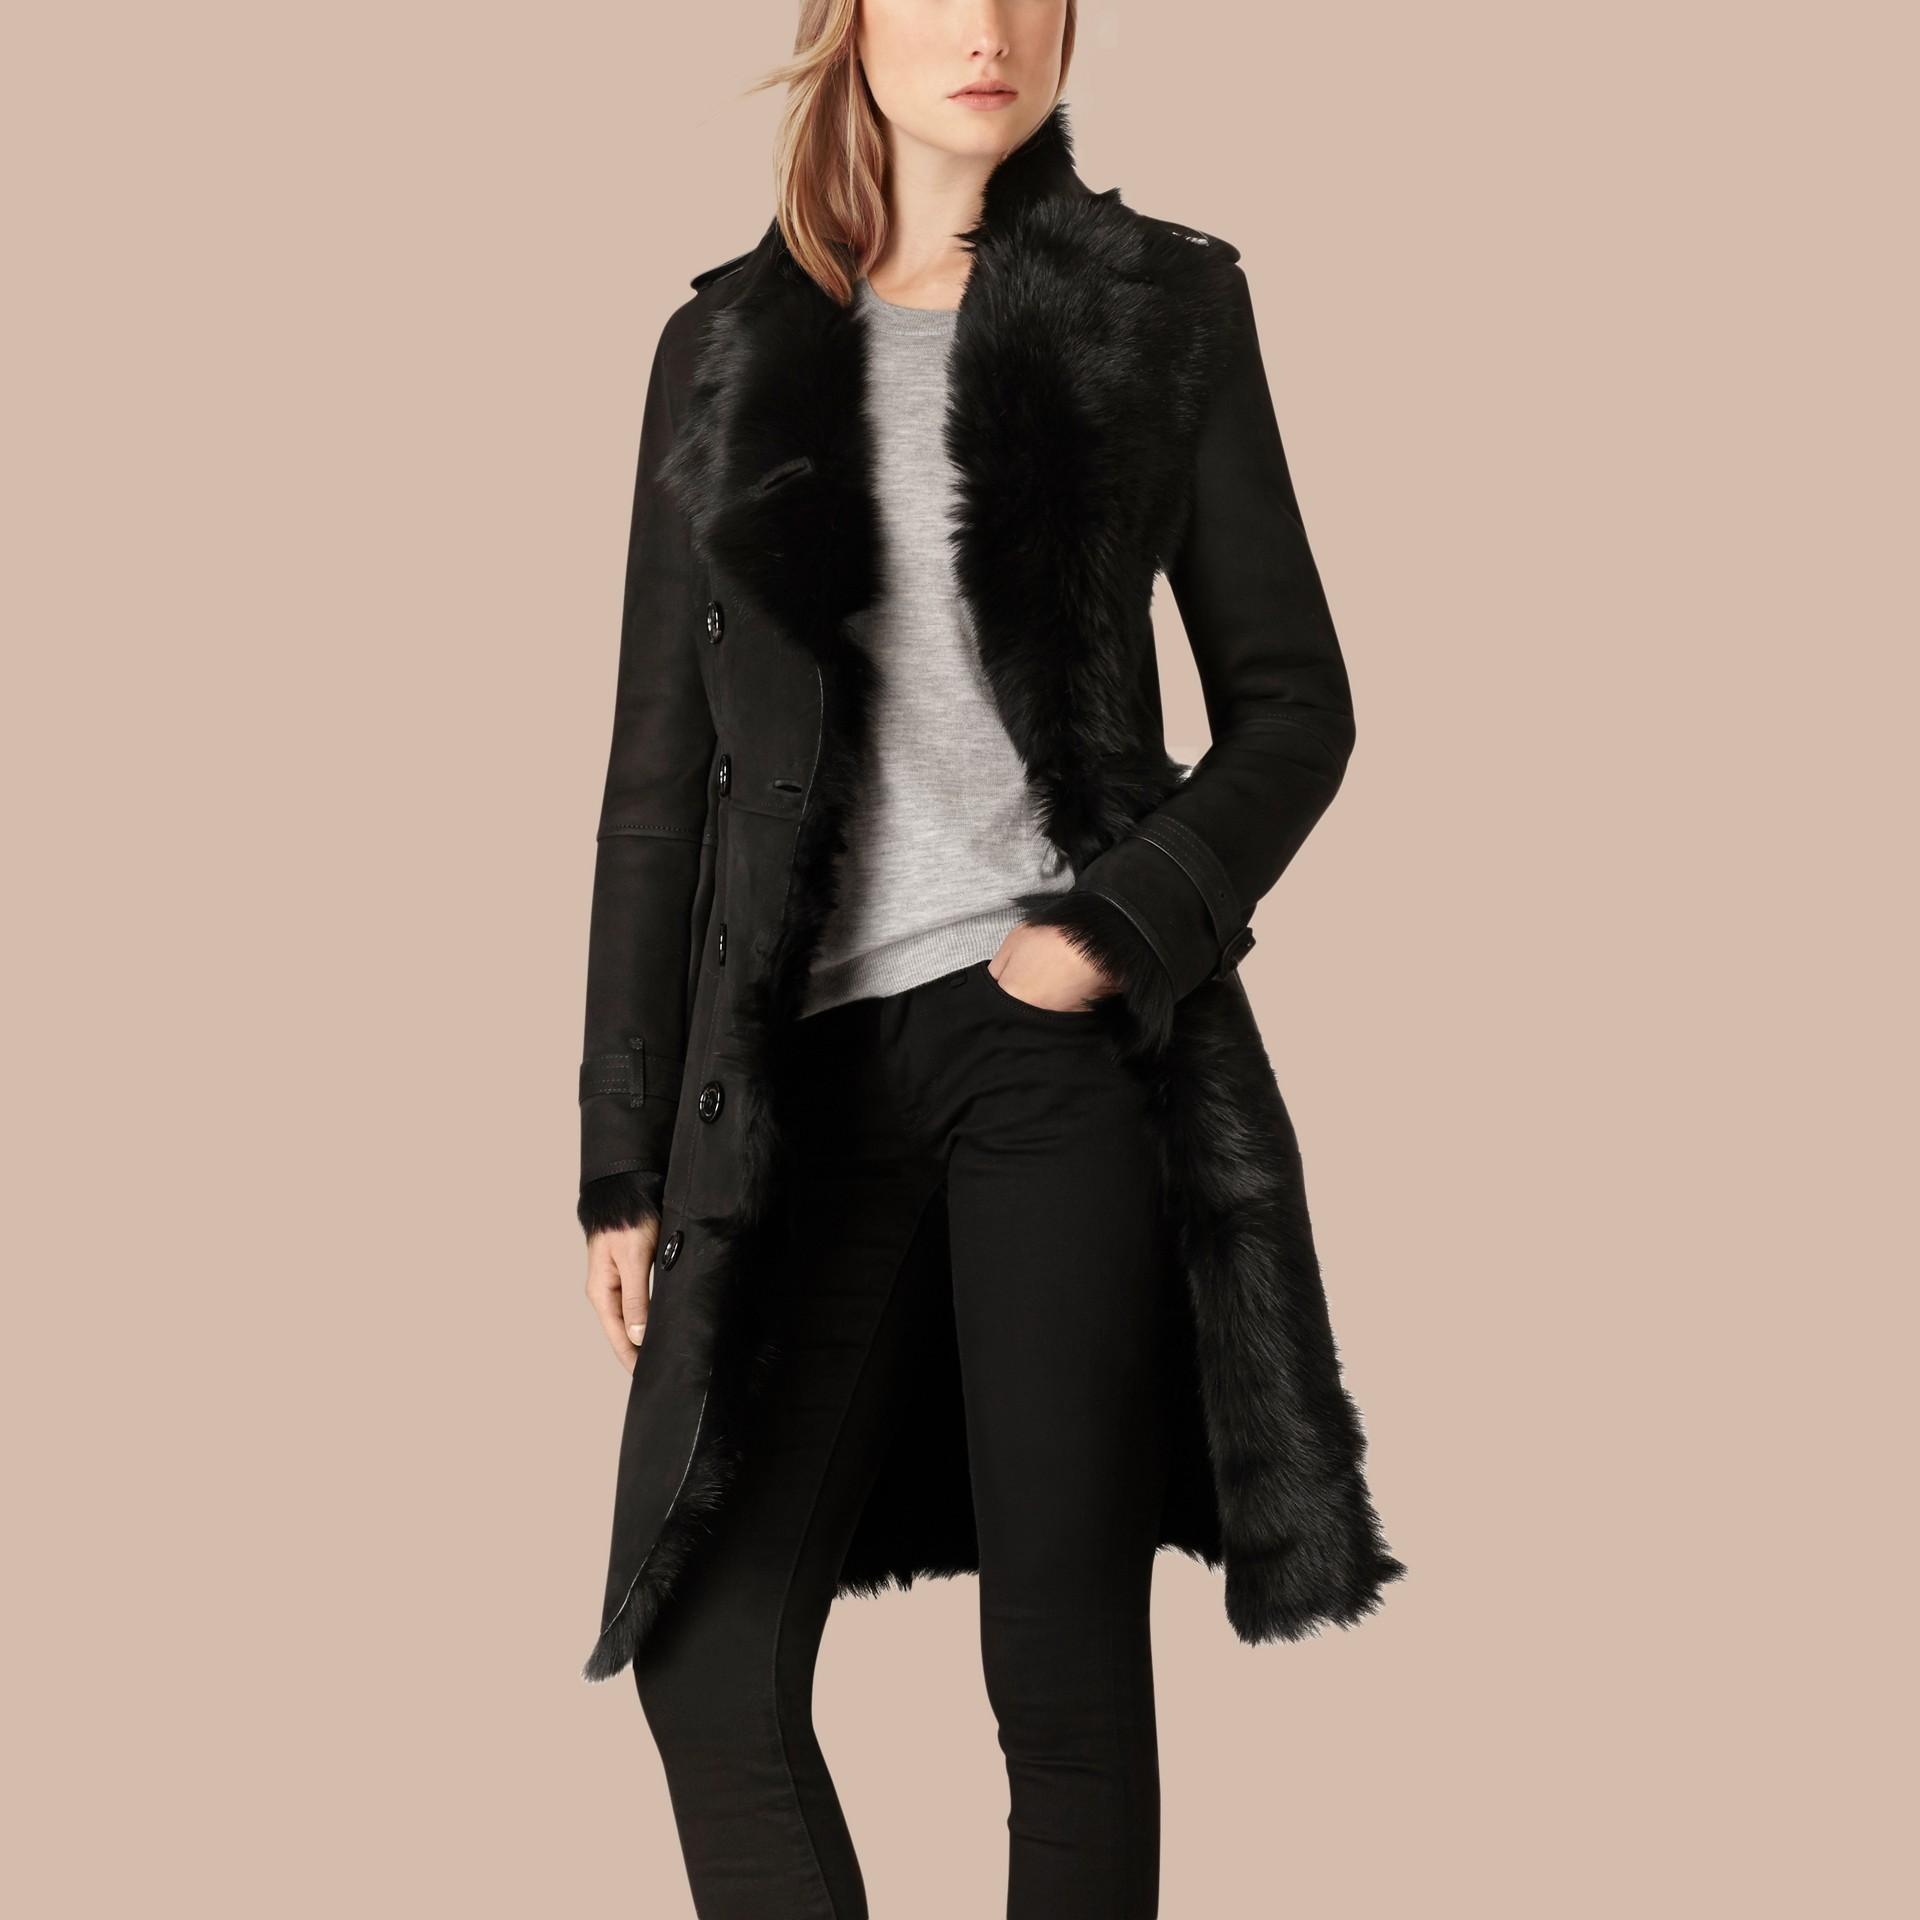 Noir Trench-coat en shearling Noir - photo de la galerie 3